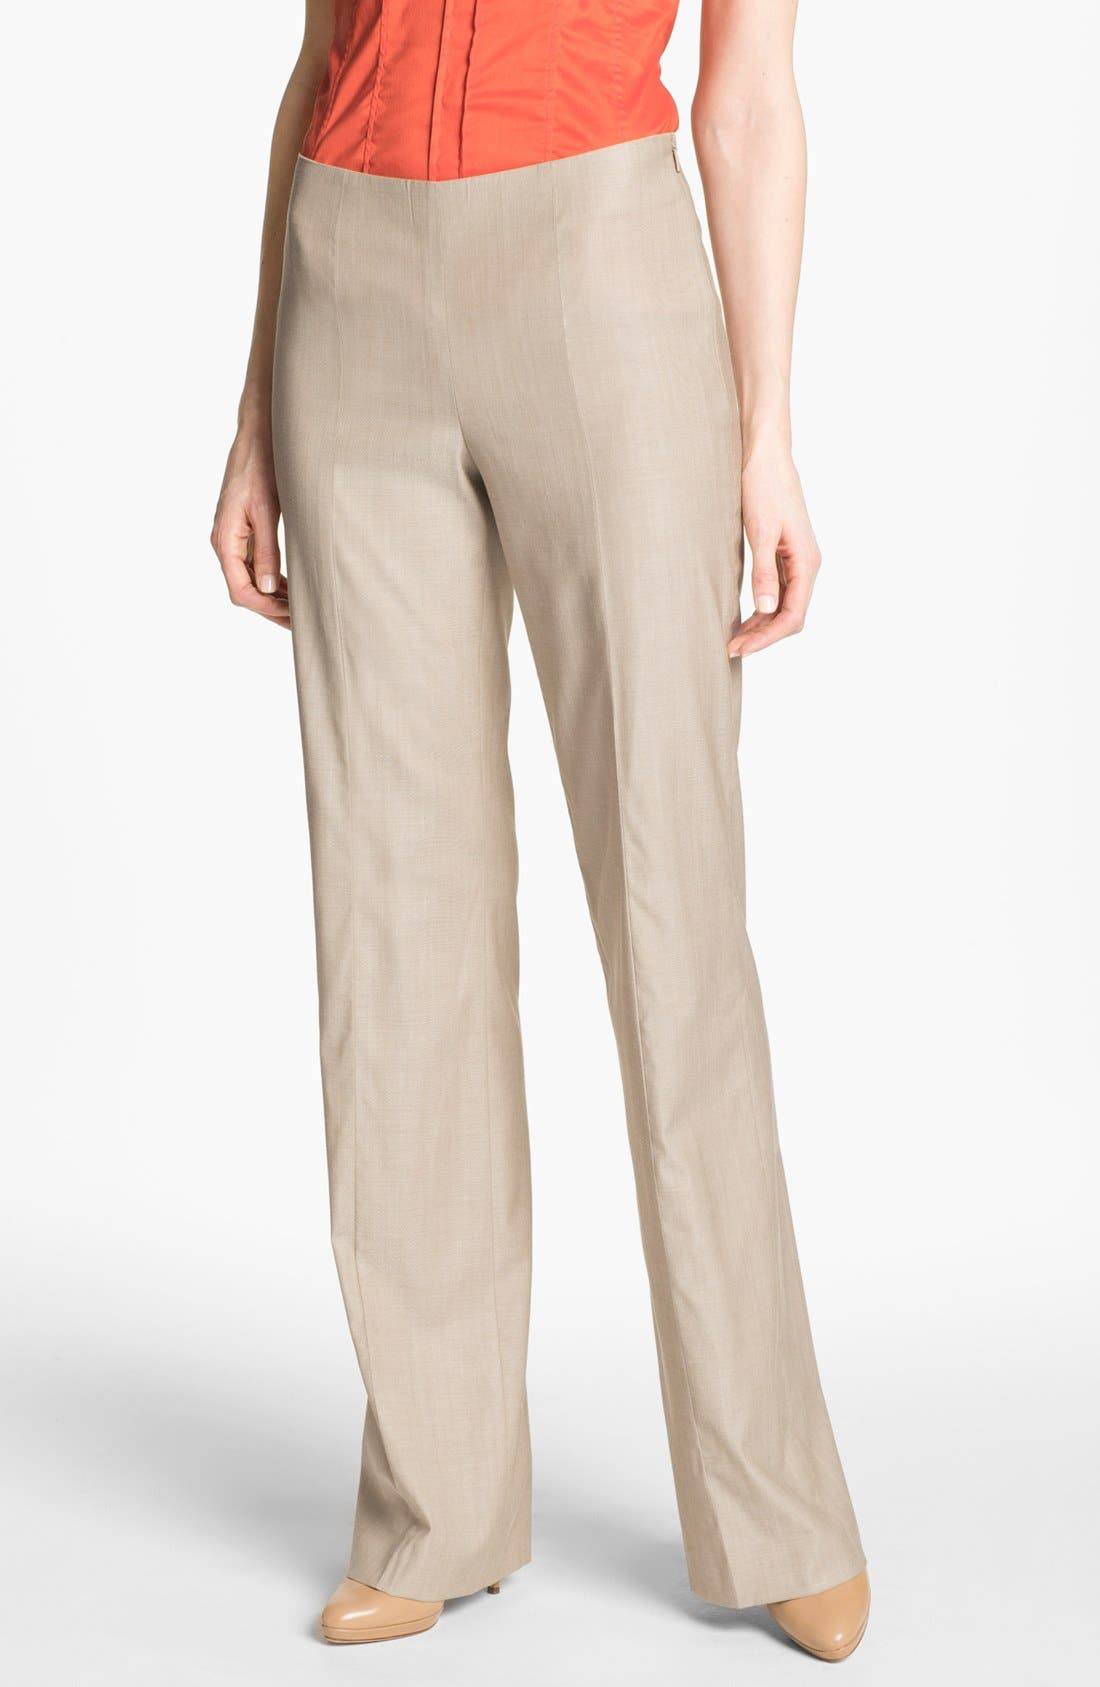 HUGO BOSS 'Tilana' Trousers,                         Main,                         color, 294